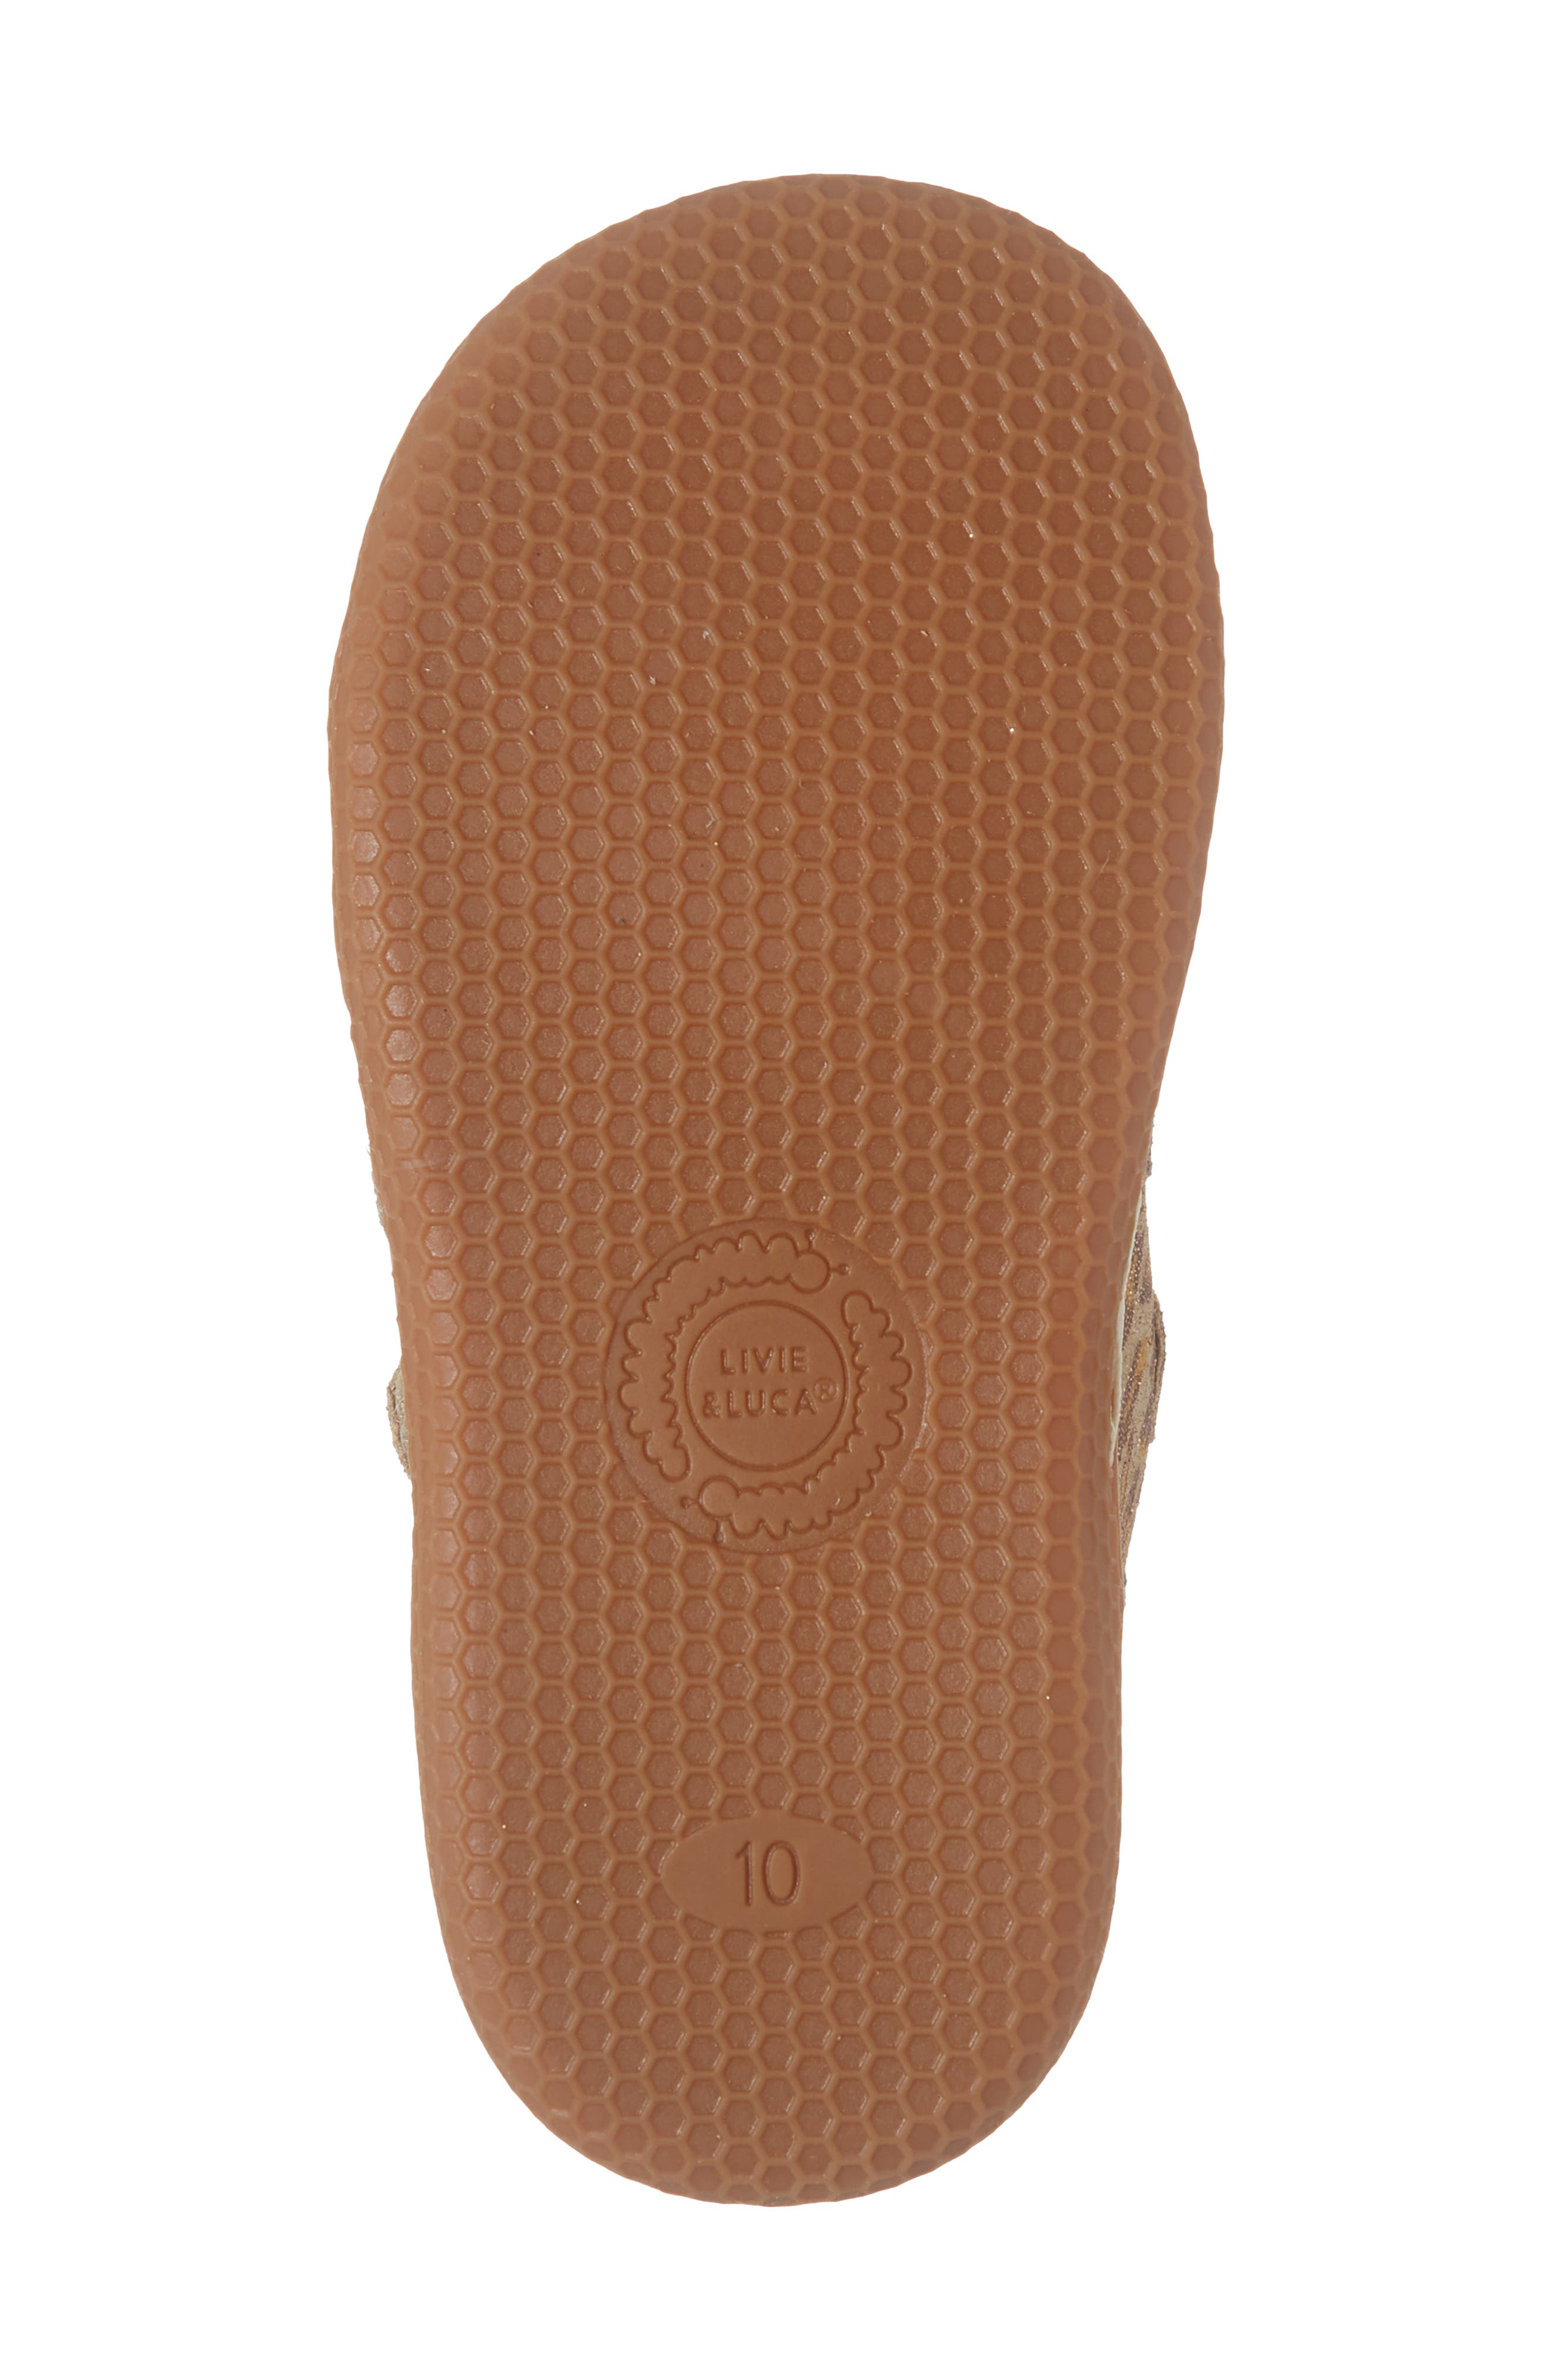 'Jamie' High Top Sneaker,                             Alternate thumbnail 6, color,                             LEOPARD SHIMMER